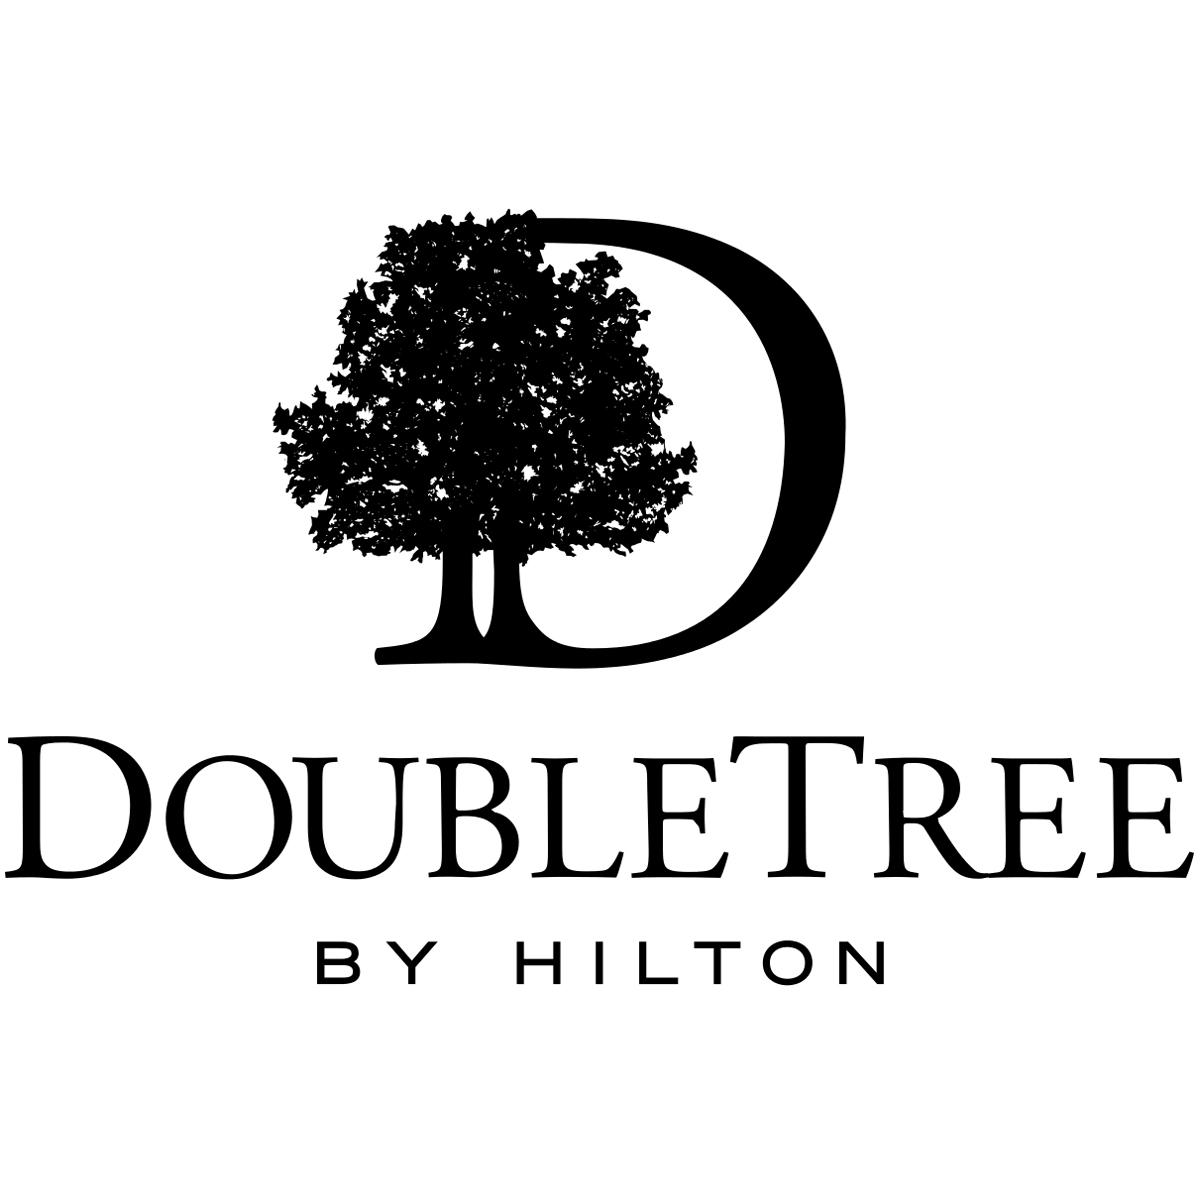 DoubletreeLogo.jpg